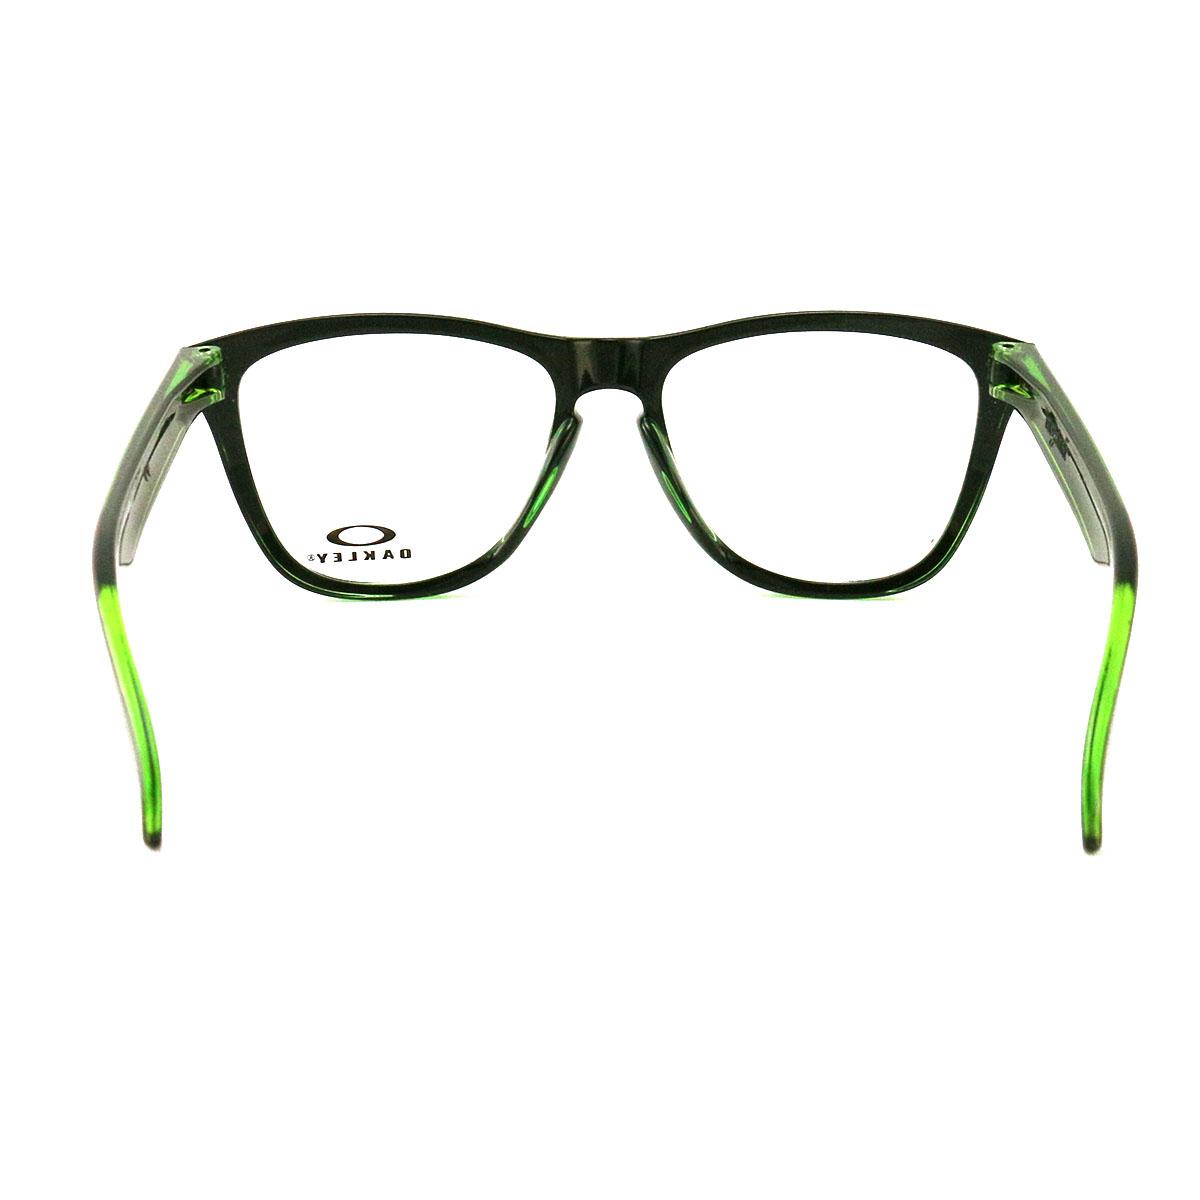 4e995ee4b2 Oakley Frogskins Green Eyeglasses OX8131-02 Demo Lens 54 17 138 ...